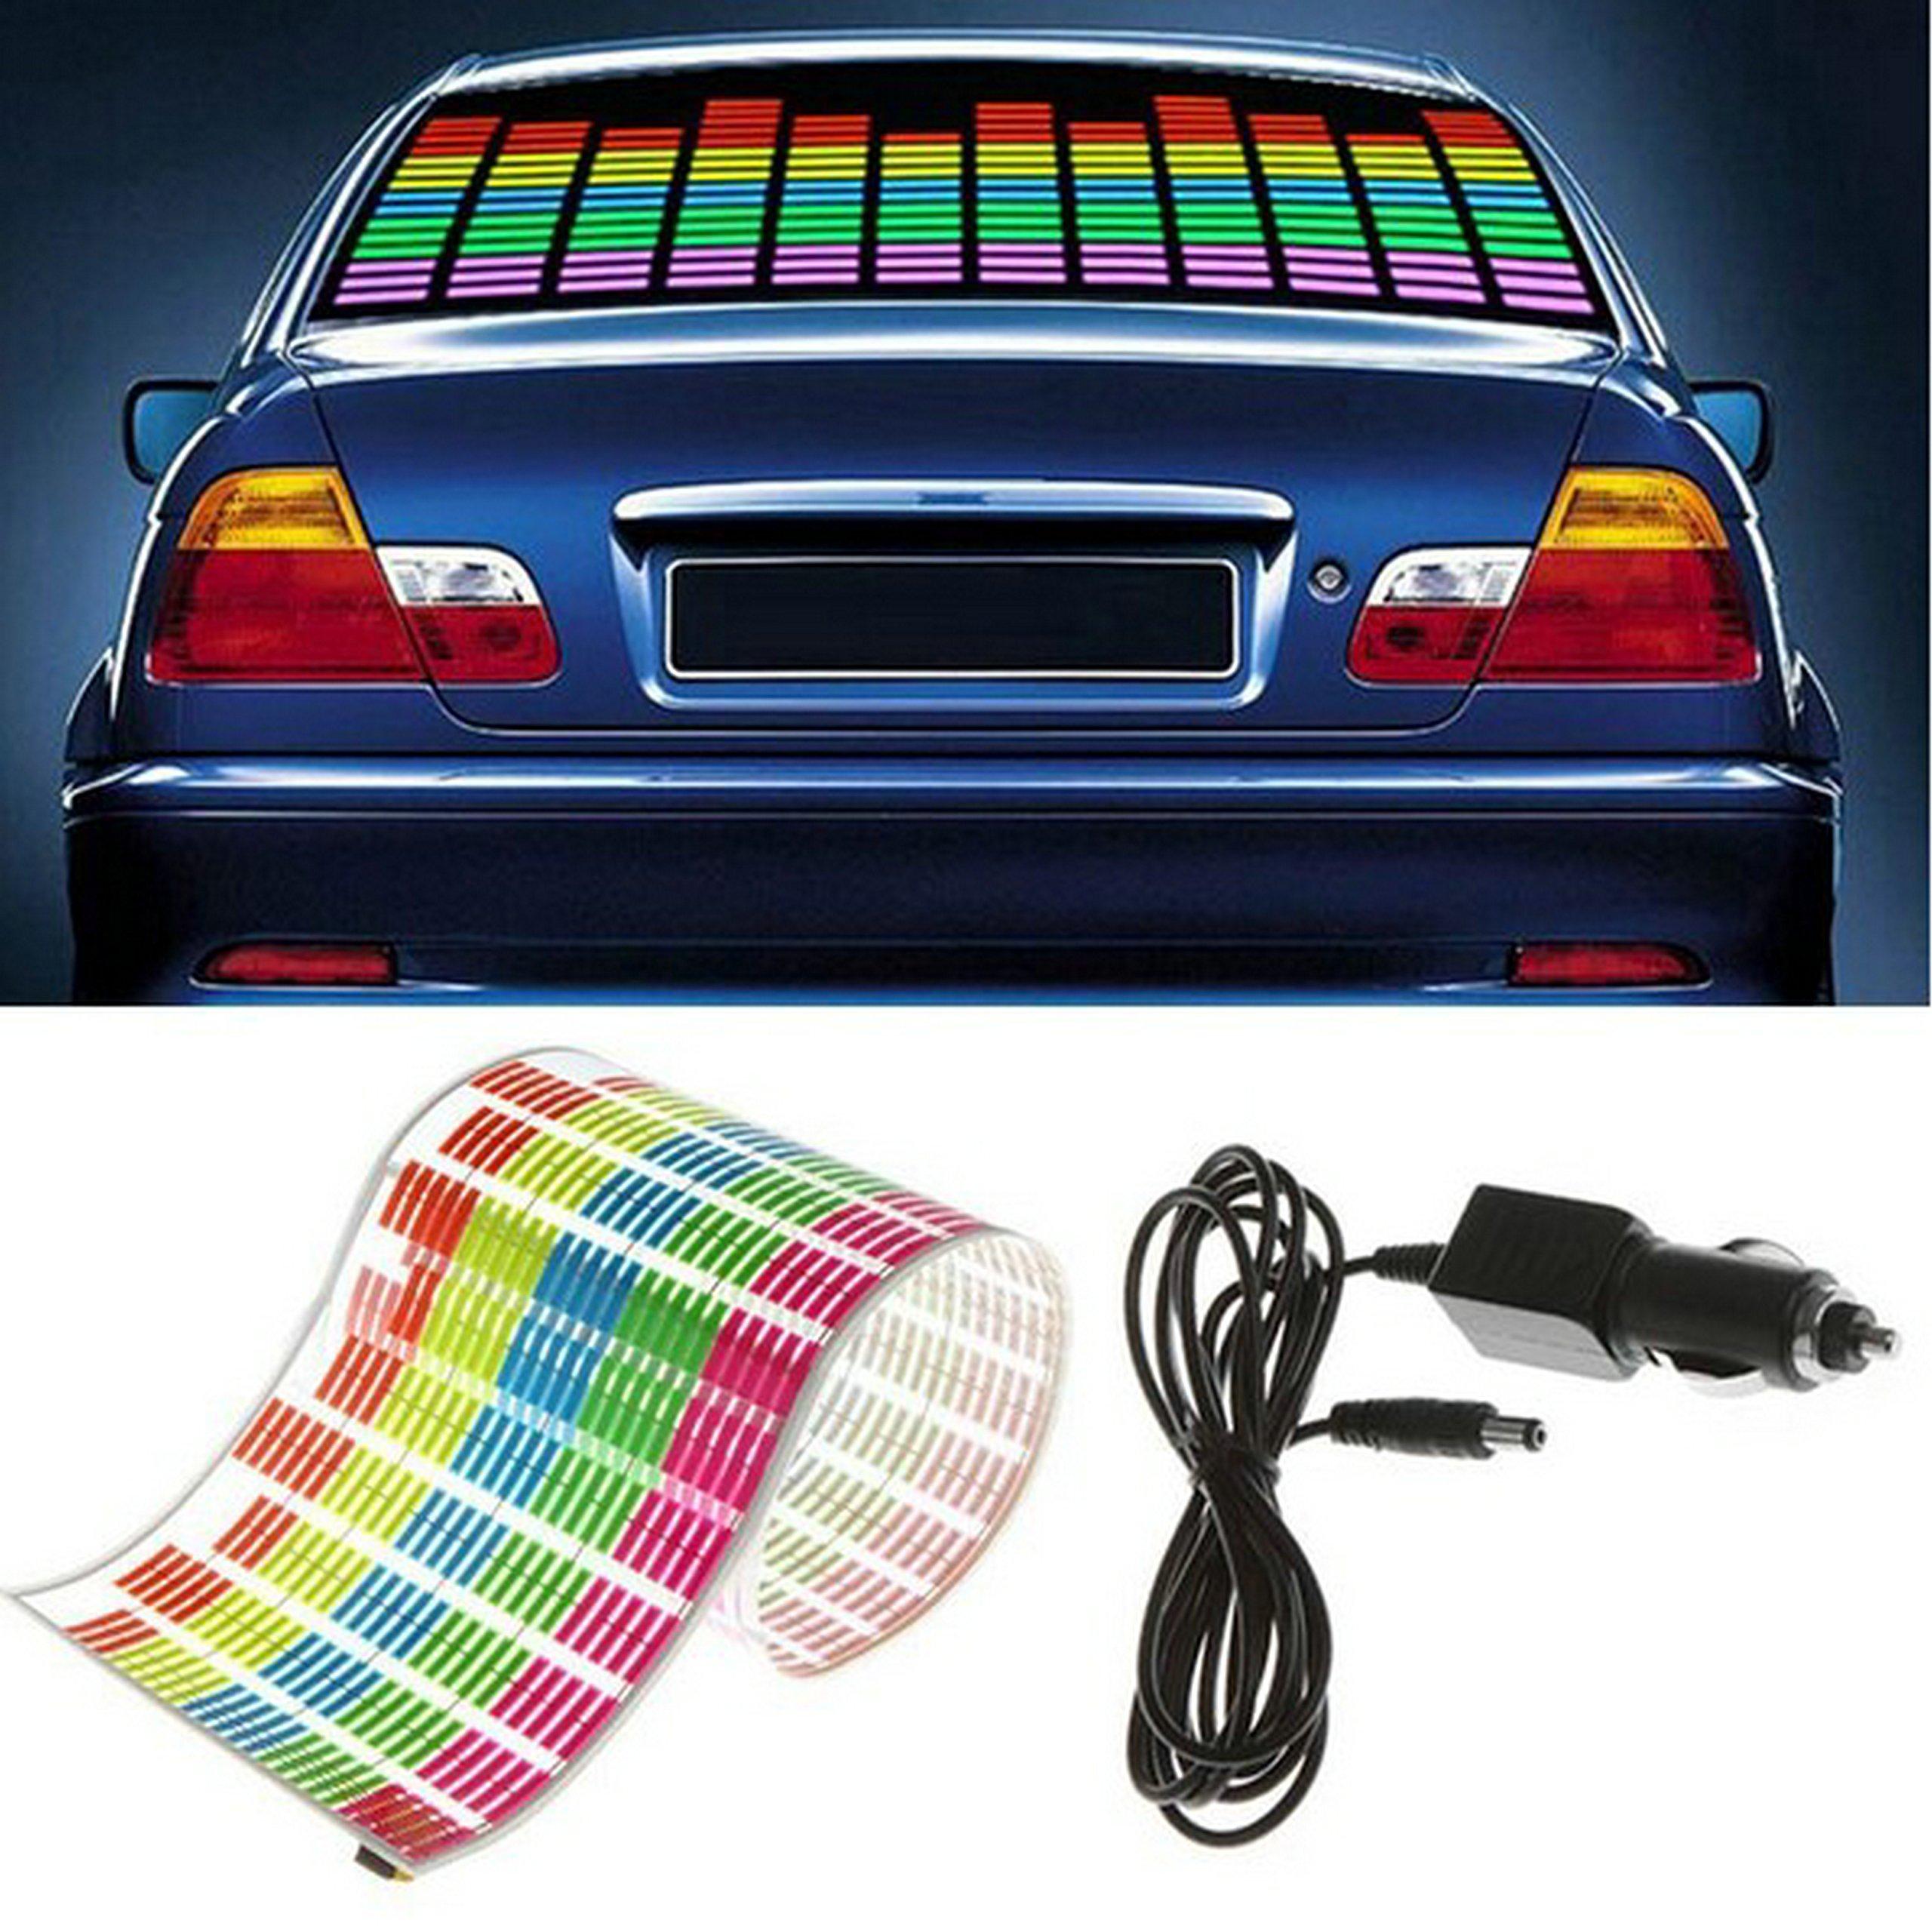 Set of 90 X 25cm Sound Music Activated El Car Sticker Equalizer Glow Flash Panel LED Multi Color Decorative Light